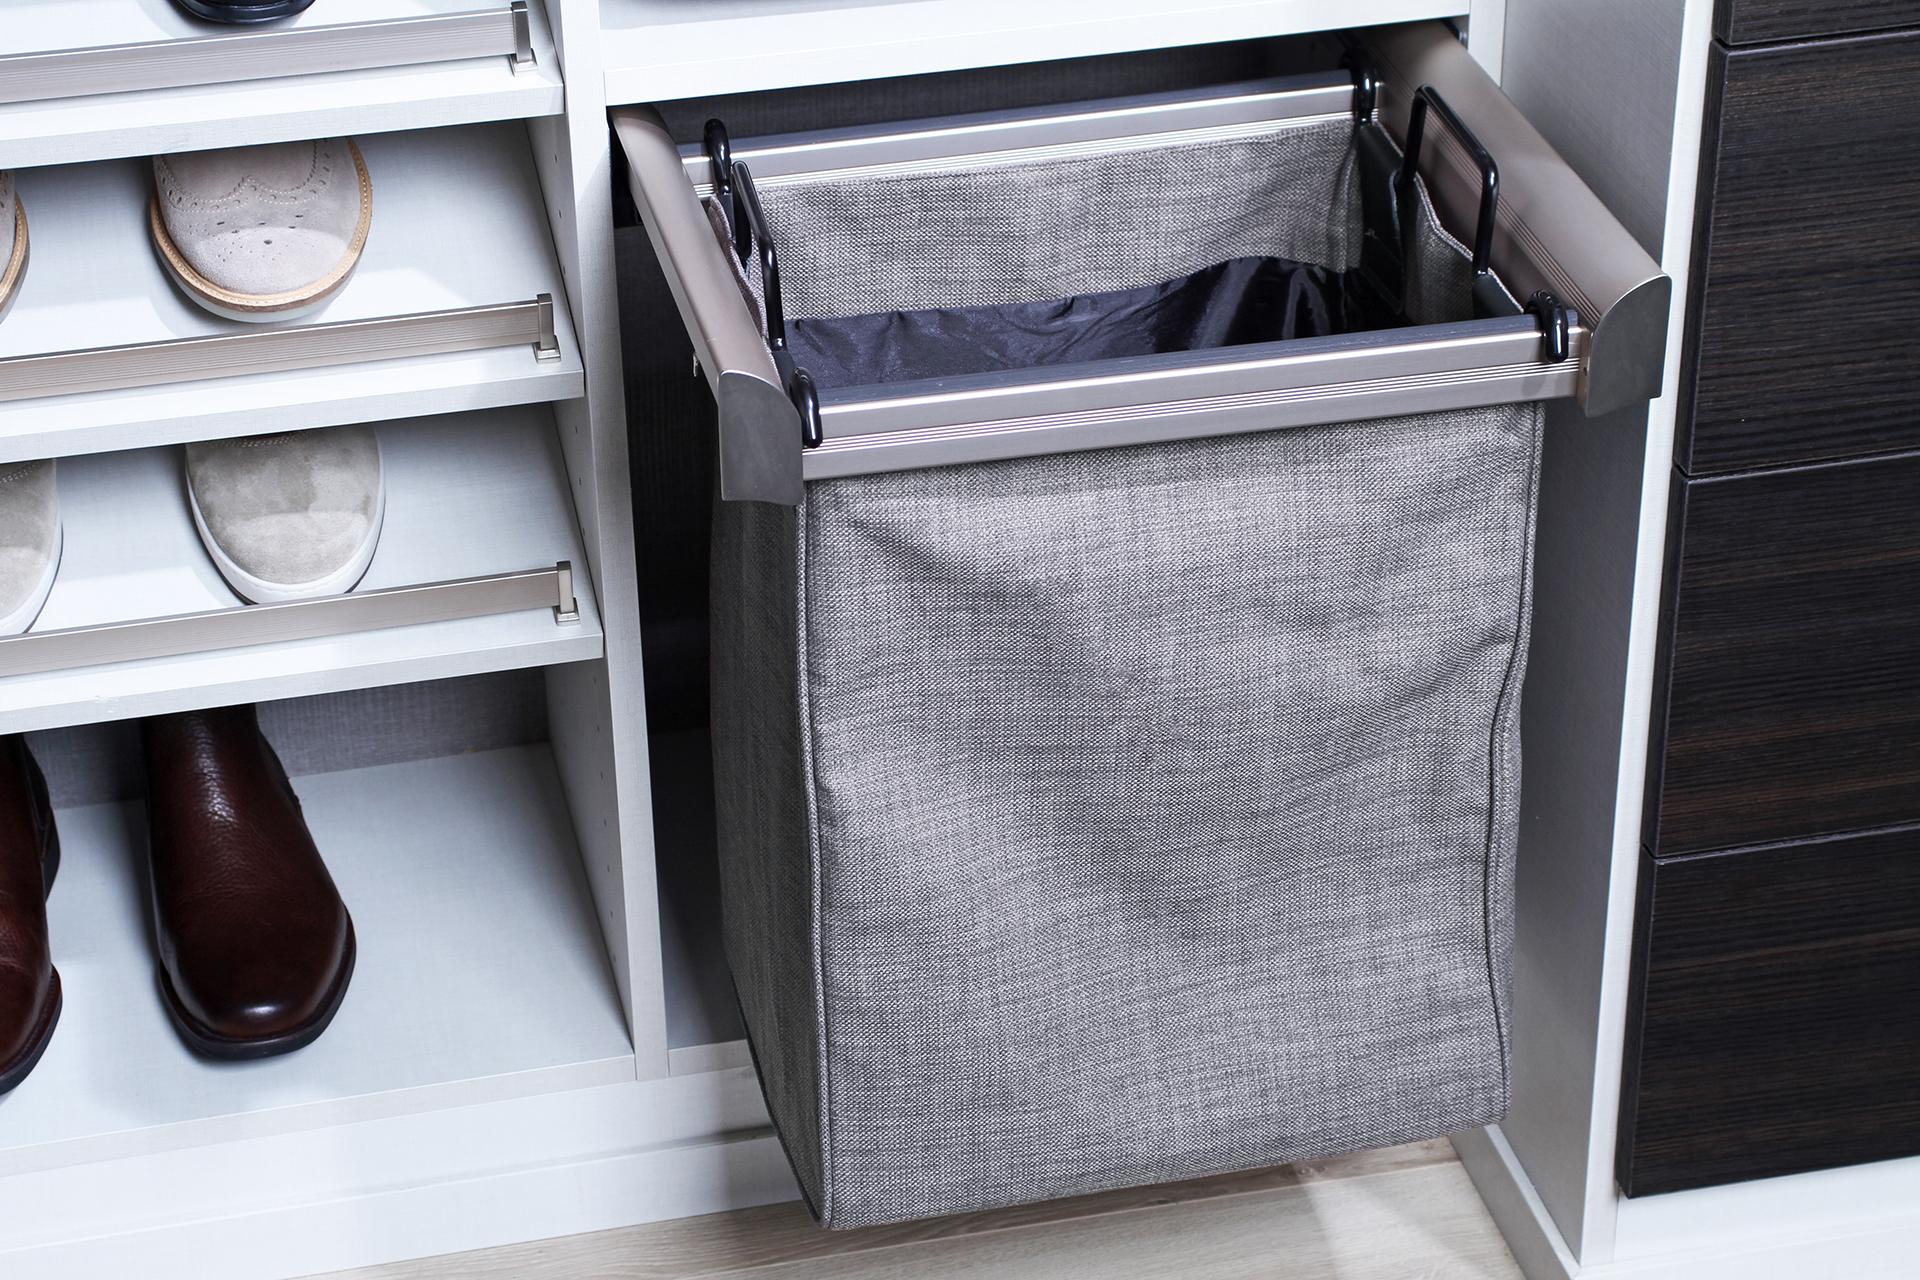 ENGAGE_Laundry-Organizer-1Bag_MAL